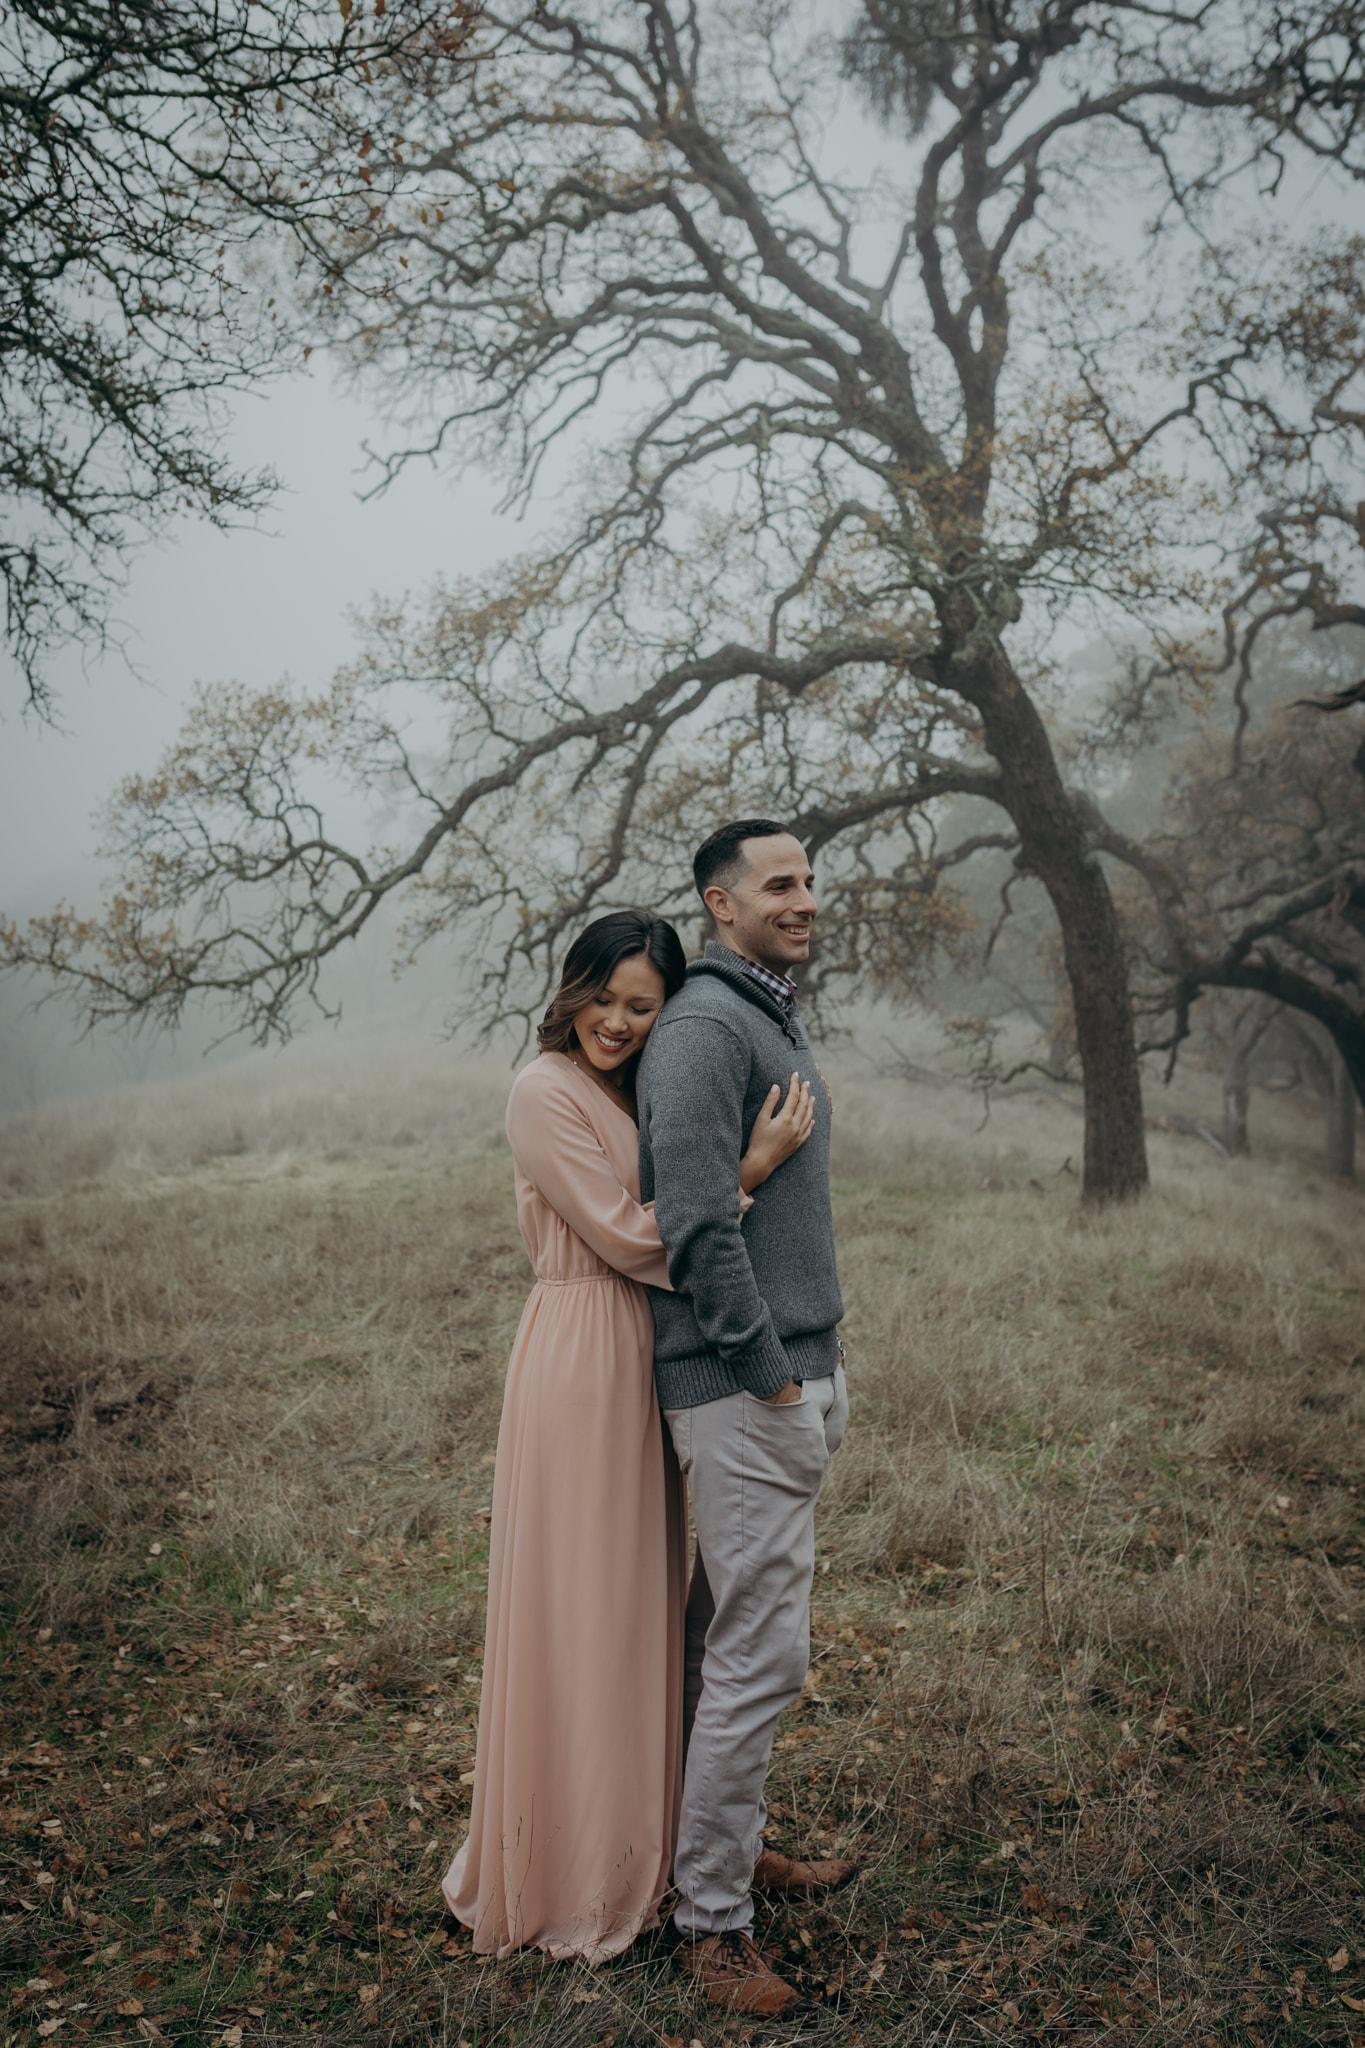 Walnut Creek Engagement Session Couple foggy